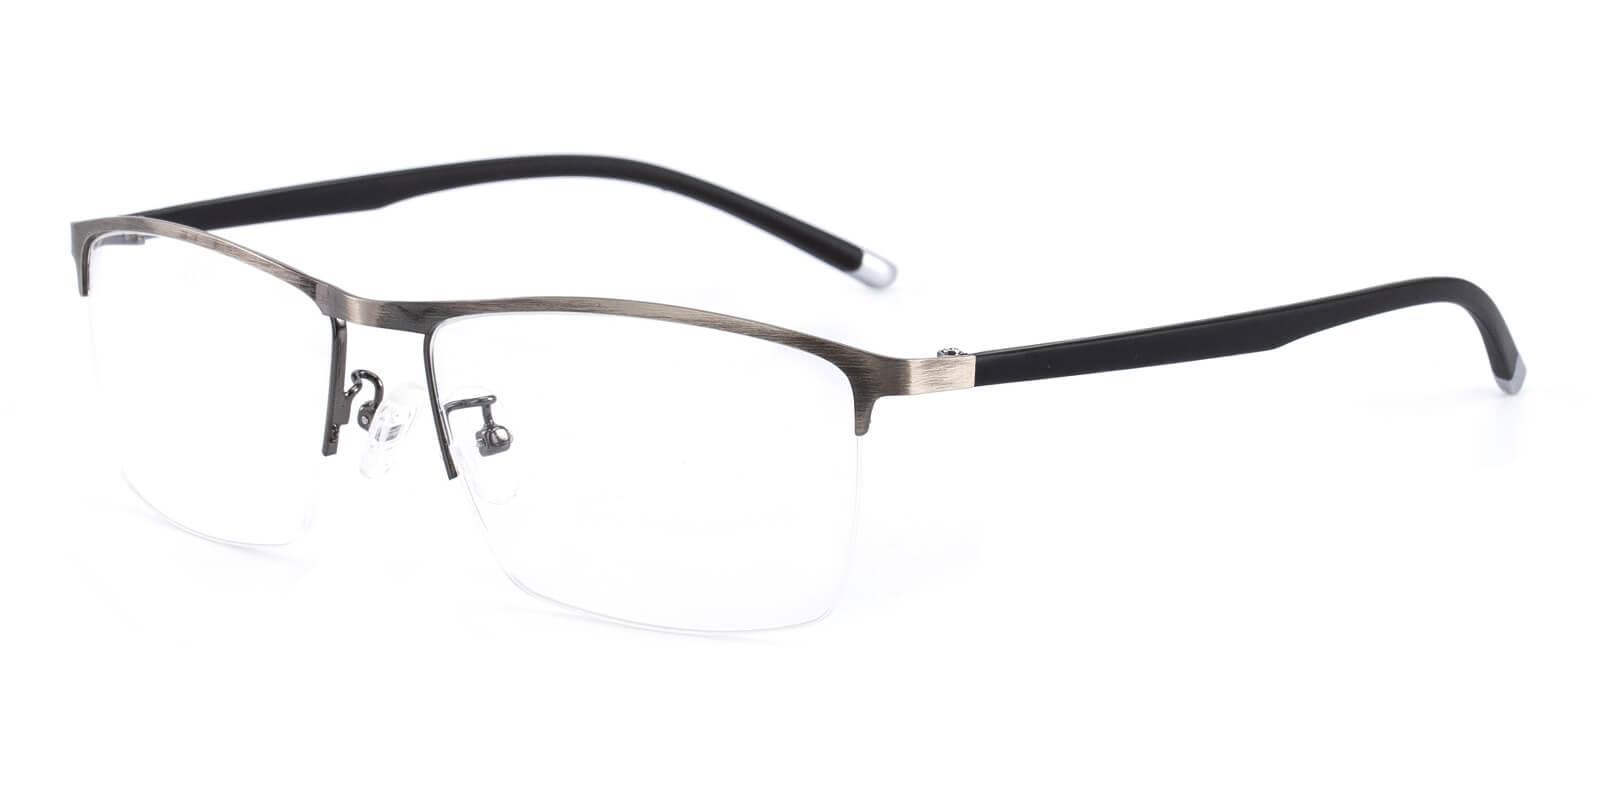 Simon-Gun-Rectangle-Metal-Eyeglasses-additional1